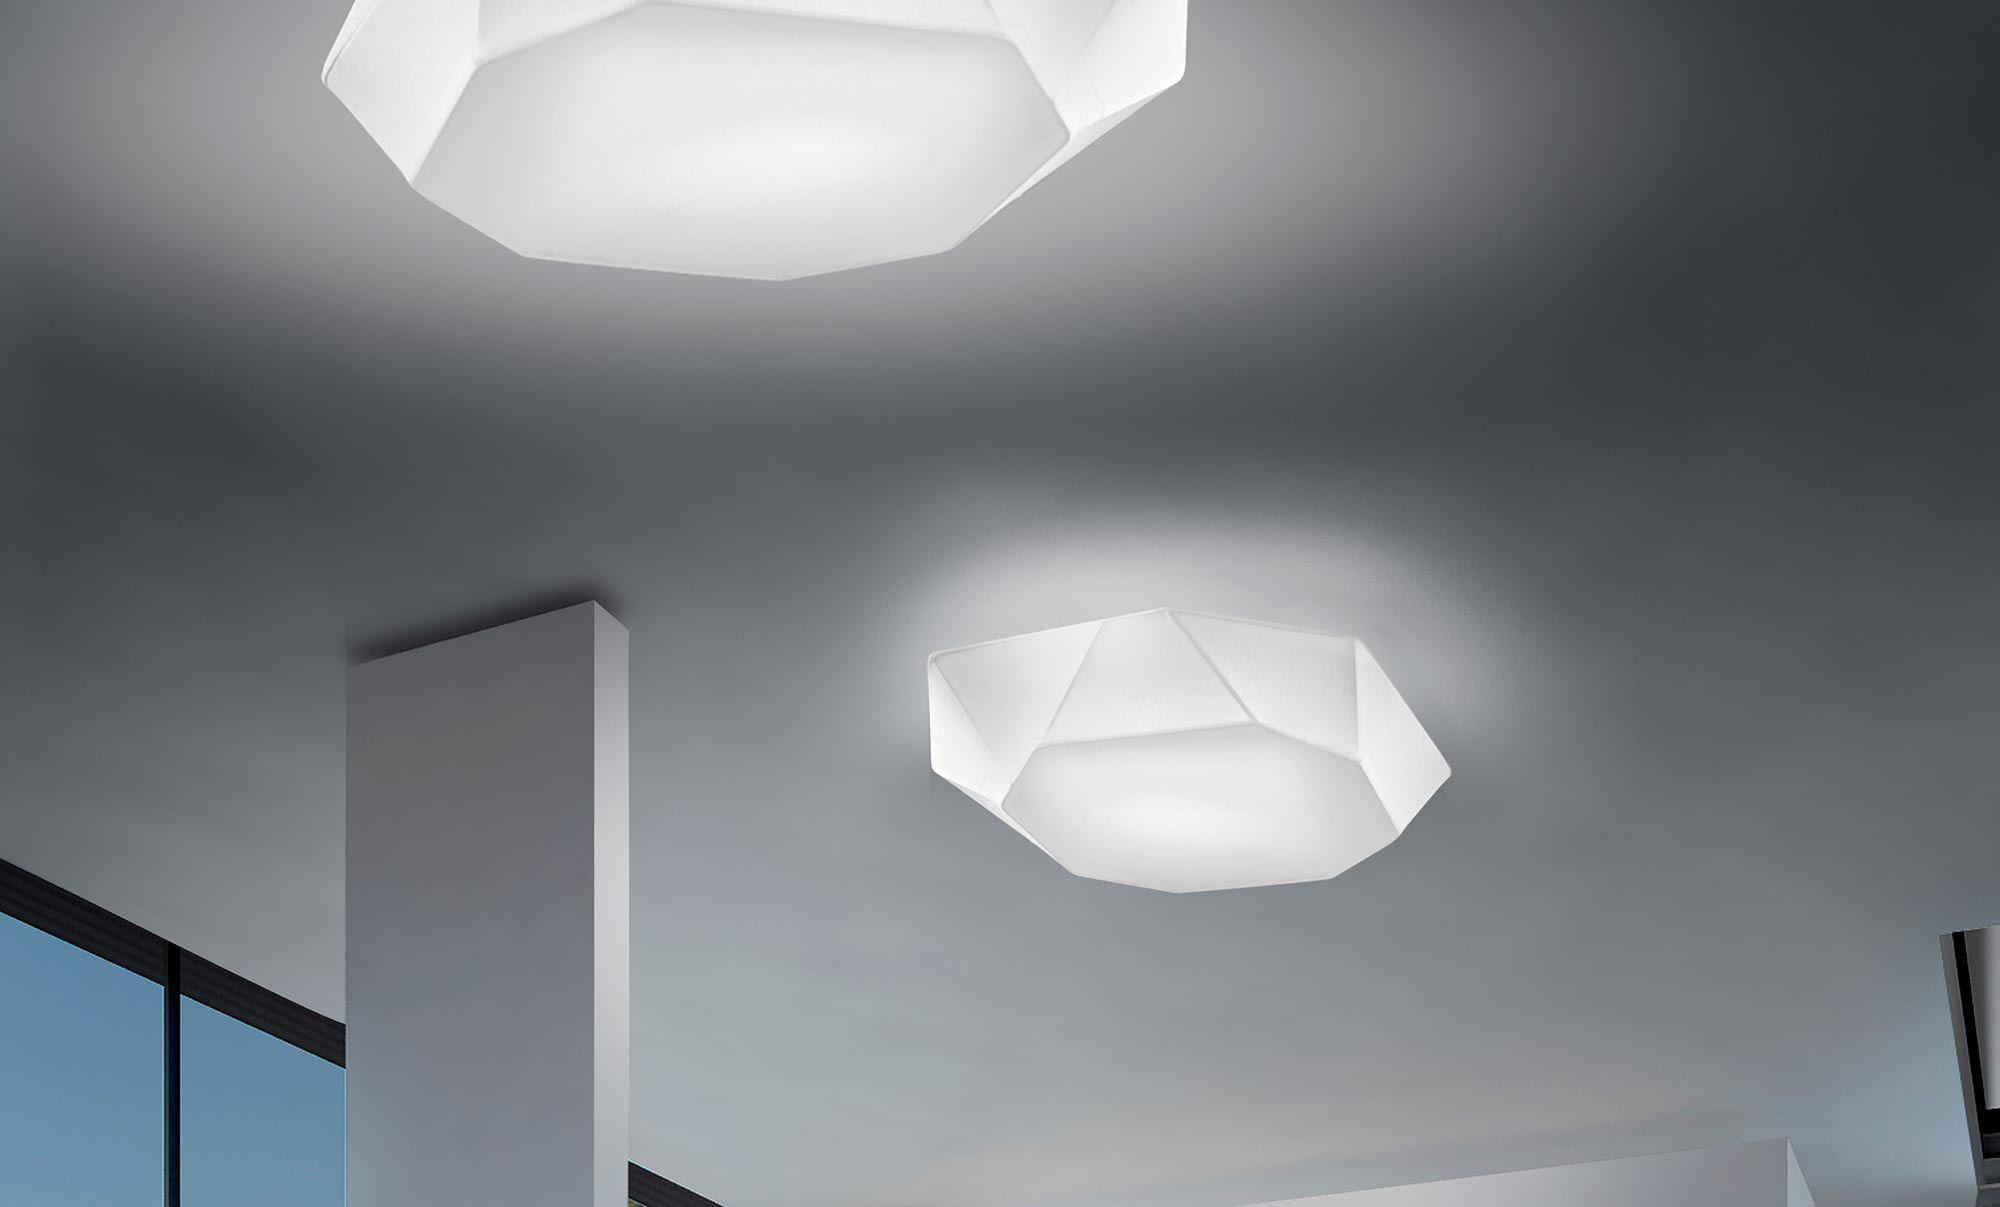 Plafoniere Moderne In Tessuto : Plafoniera moderna in tessuto led da interno viki panzeri